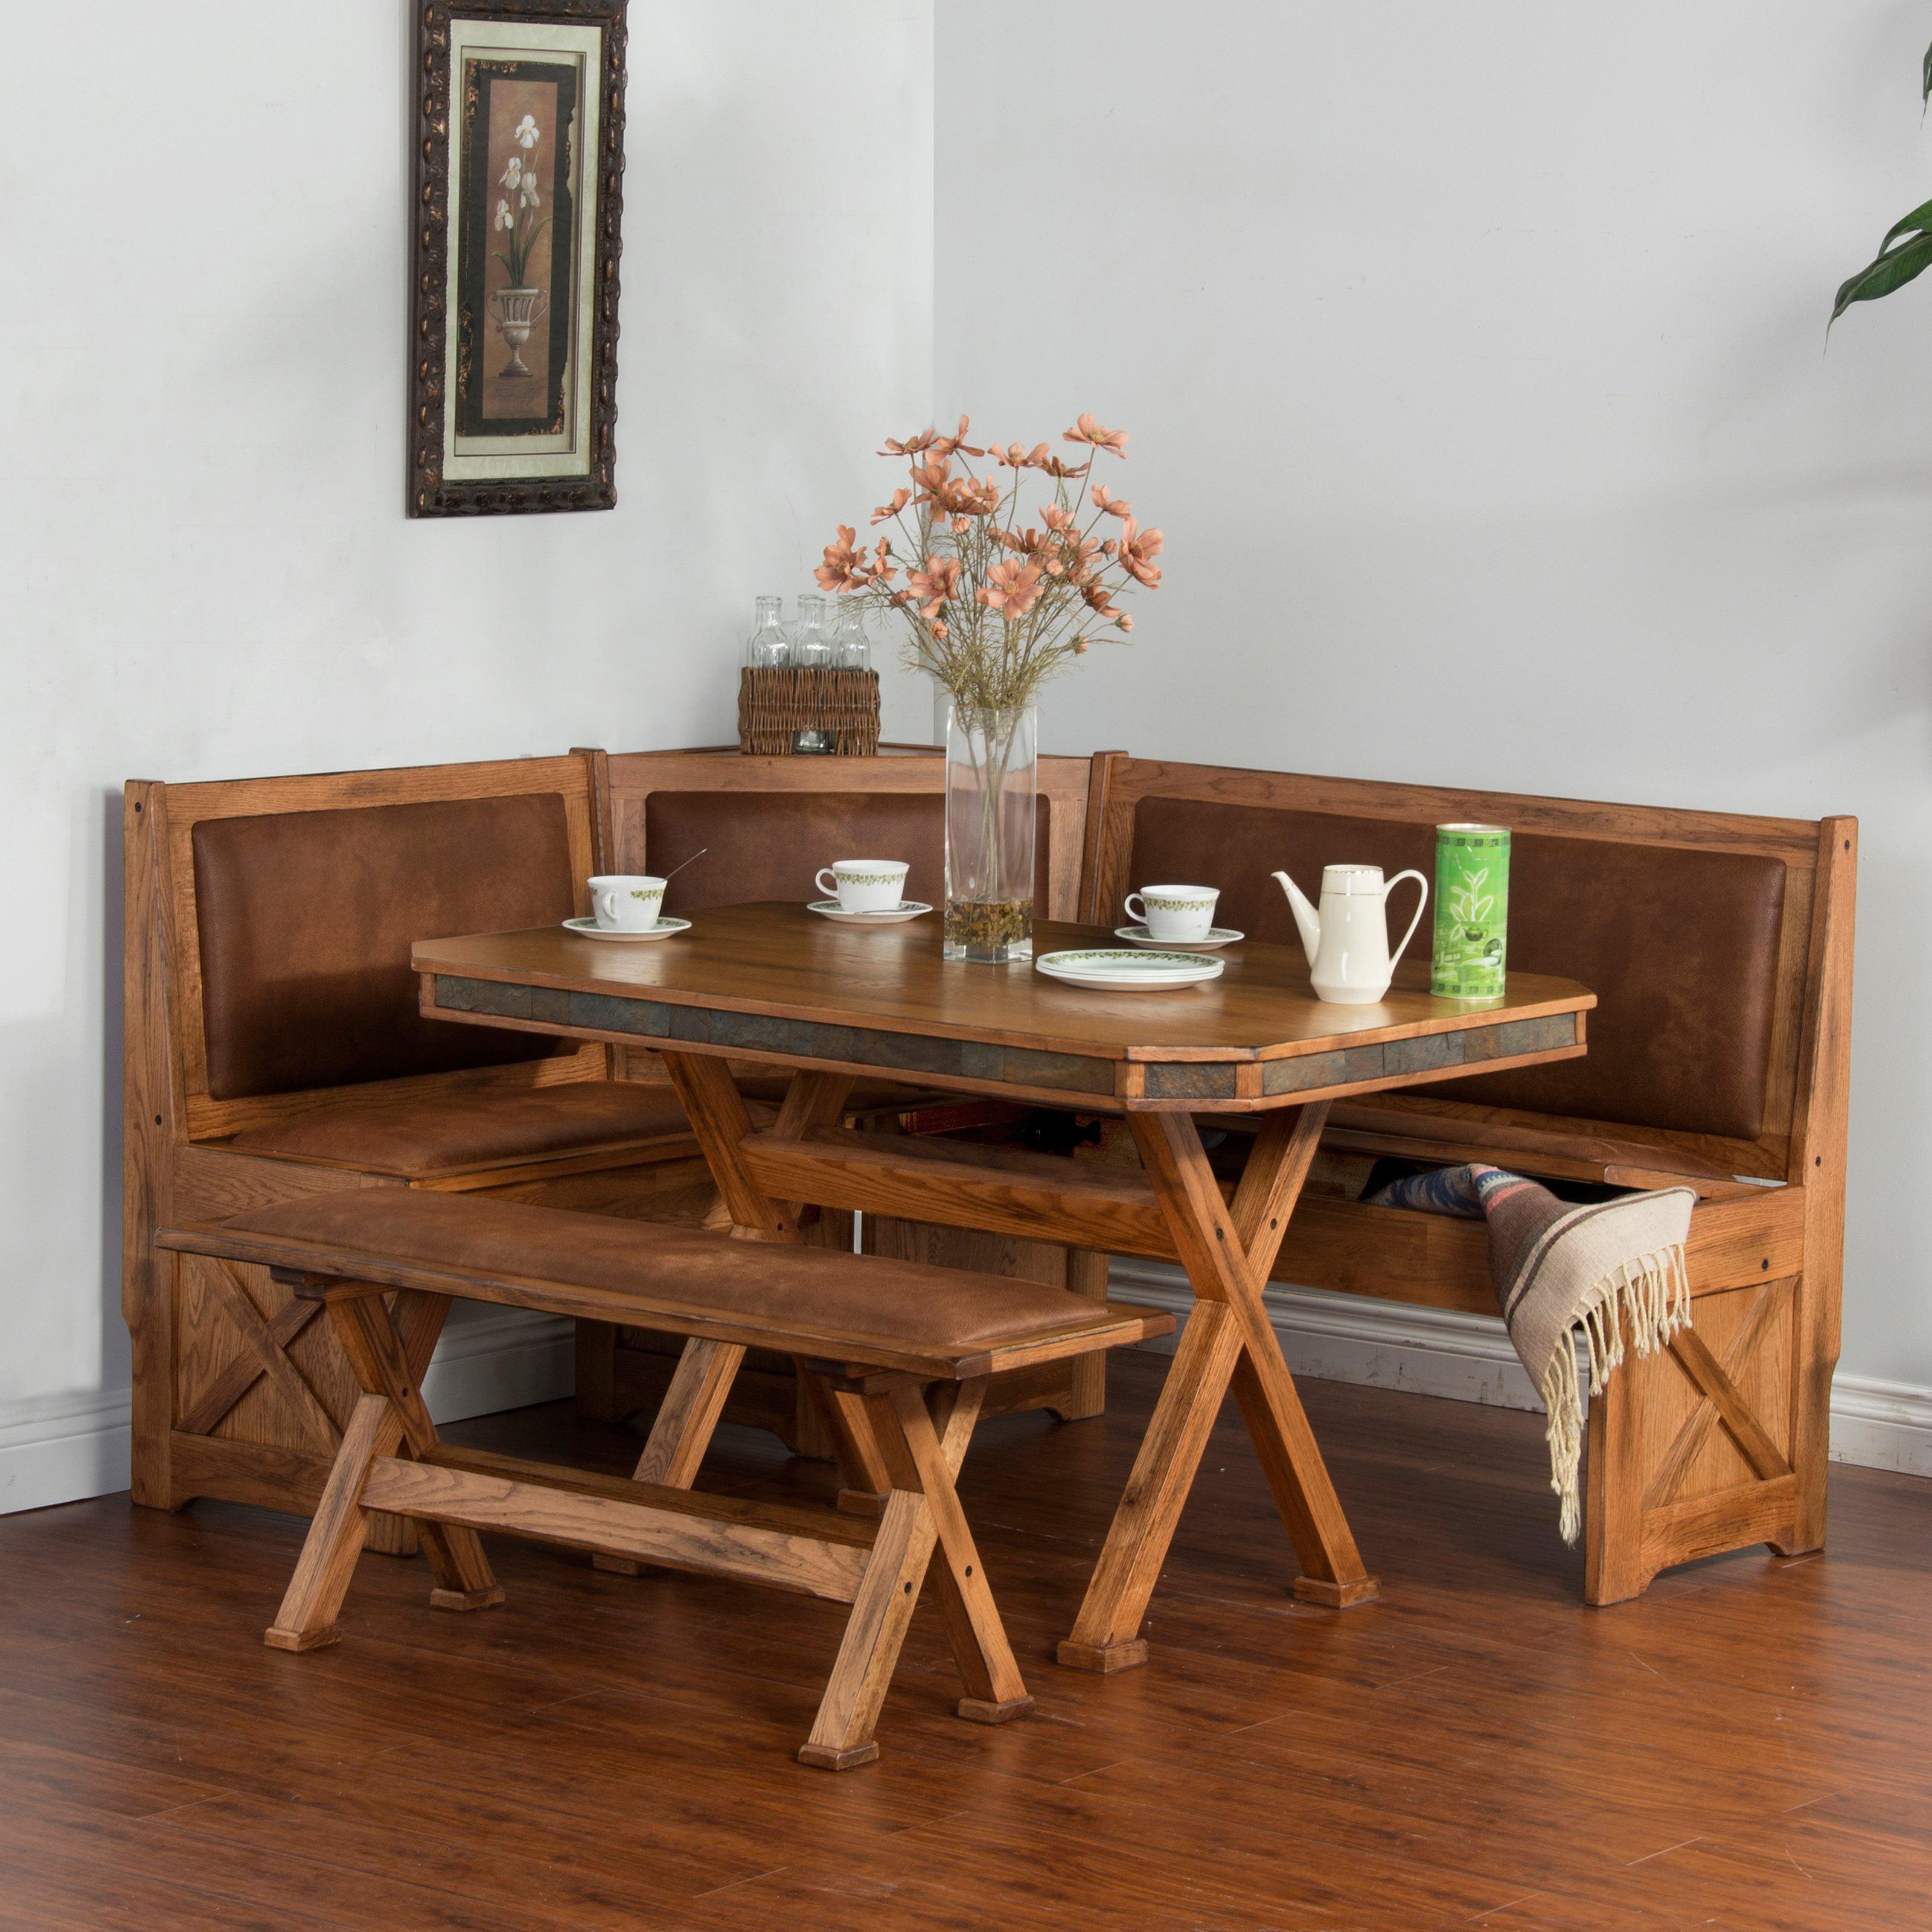 Sunny Designs Sedona 4 Piece Breakfast Nook Set with Side...